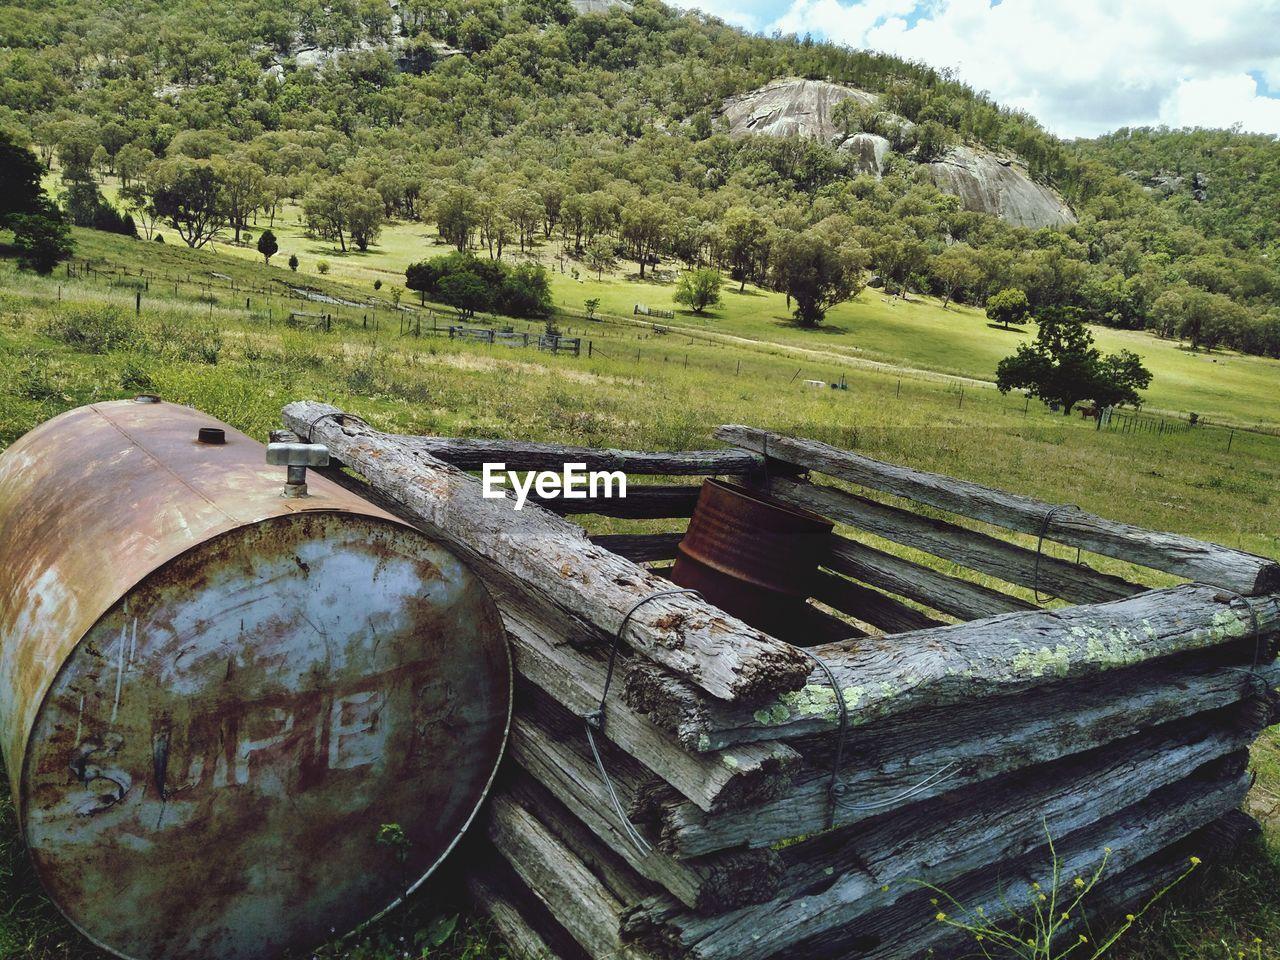 barrel, field, day, no people, landscape, nature, tree, outdoors, wine cask, beauty in nature, scenics, sky